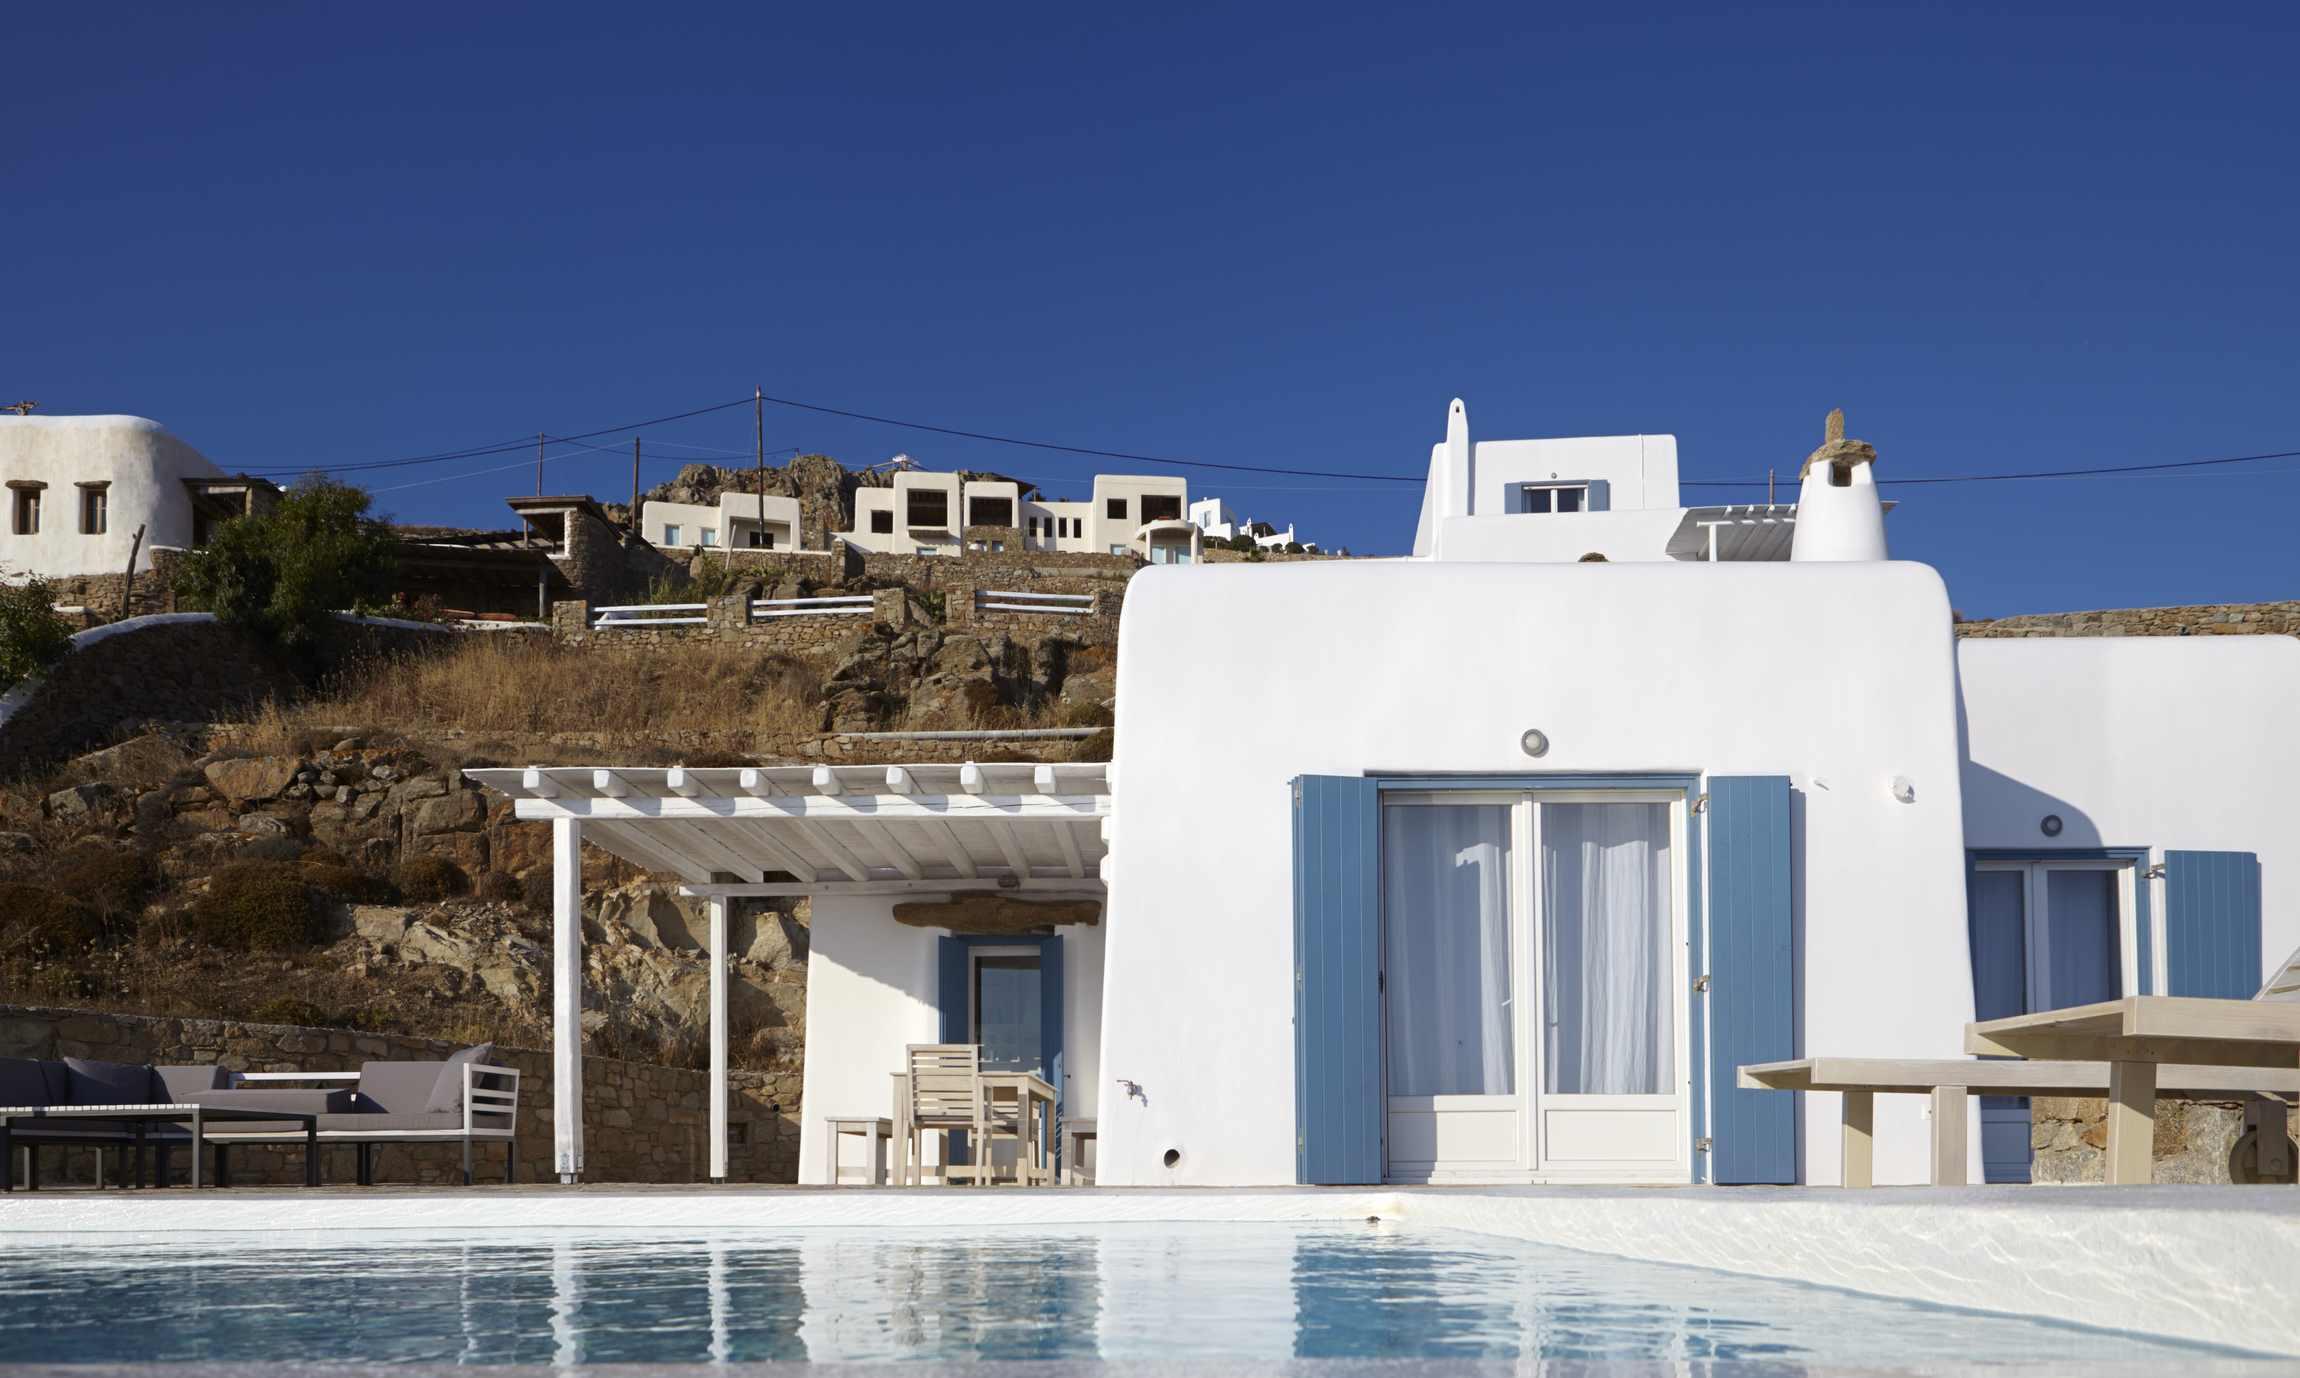 reallifecam villa